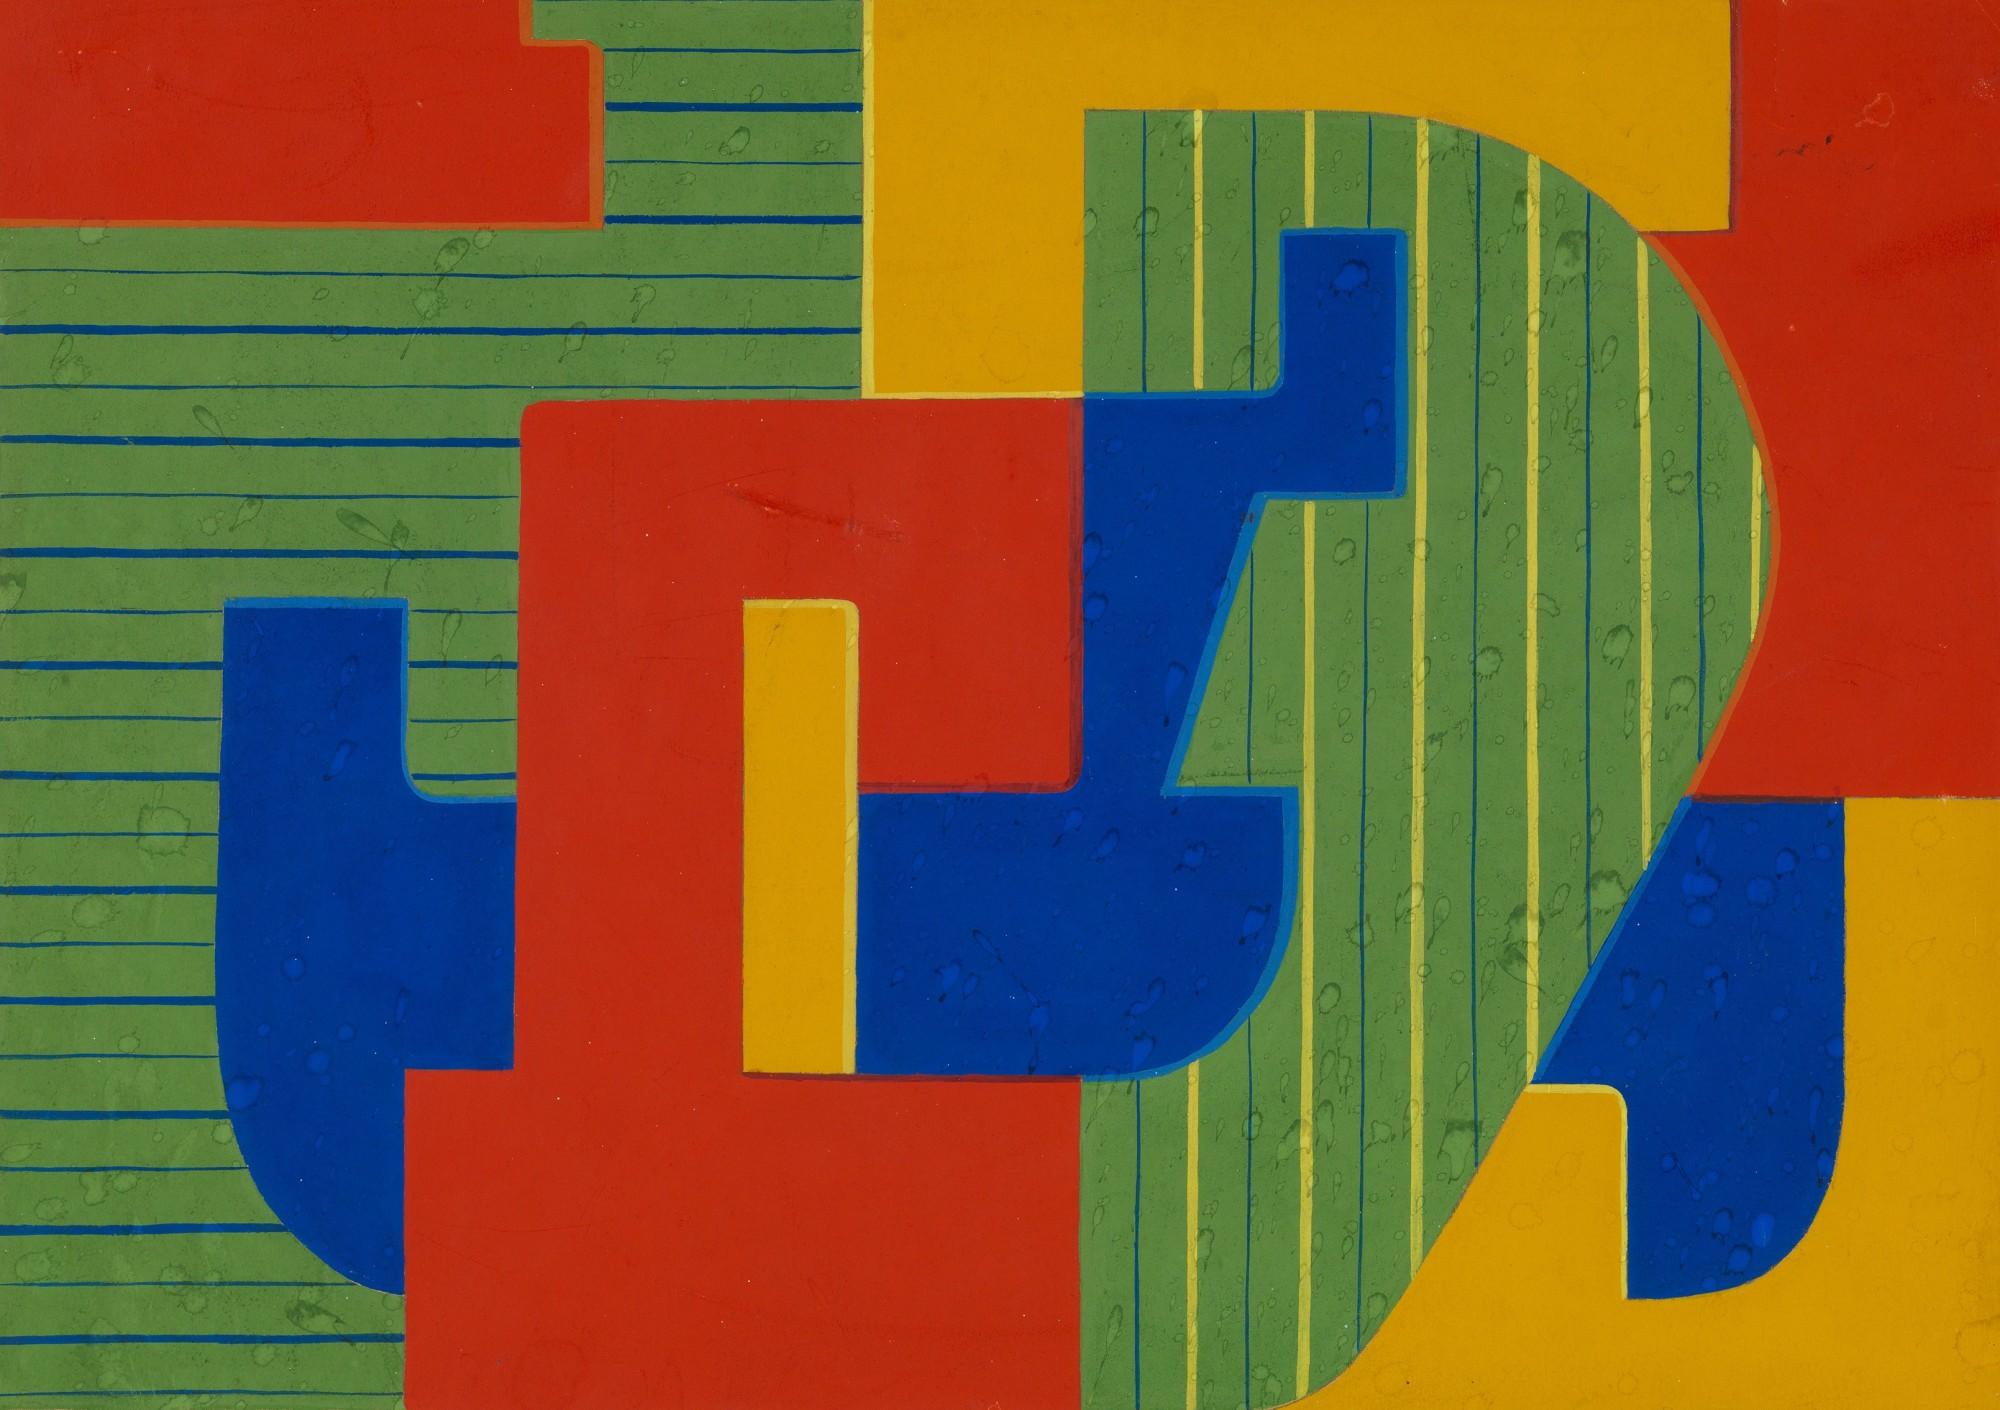 "<span class=""link fancybox-details-link""><a href=""/exhibitions/554/works/artworks_standalone10374/"">View Detail Page</a></span><div class=""artist""><span class=""artist""><strong>WIFREDO ARCAY</strong></span></div><div class=""title""><em>Untitled</em>, c. 1950</div><div class=""medium"">Gouache on paper</div><div class=""dimensions"">35.5 x 25 cm<br />14 x 9⅞inches</div>"